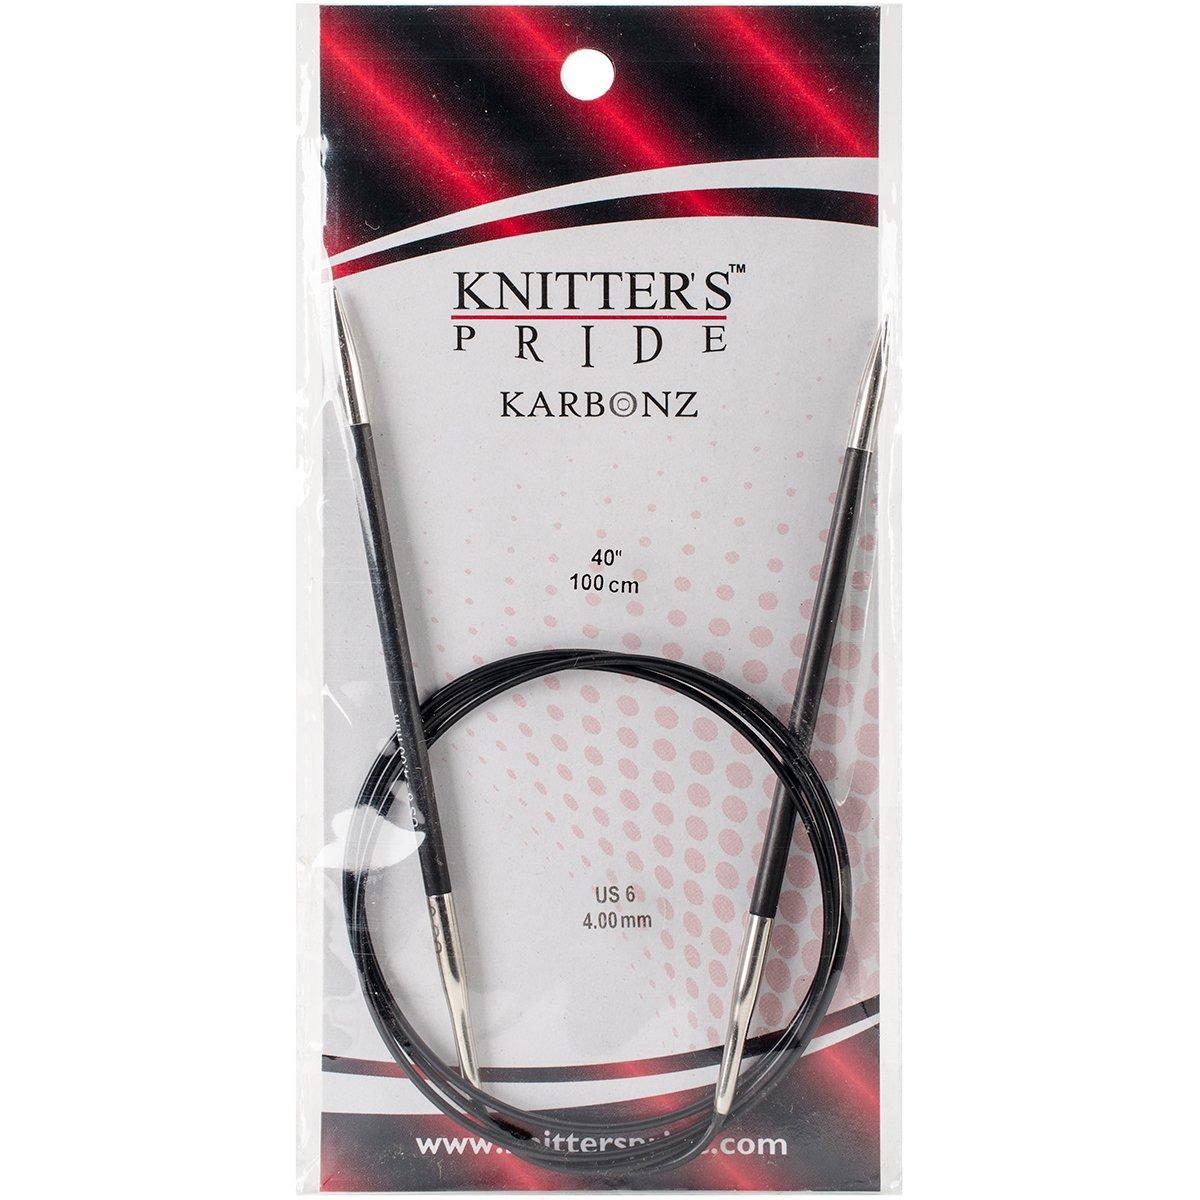 Knitter's Pride Karbonz Circular 40-inch (100cm) Knitting Needles; Size US 6 (4.00mm) 110239